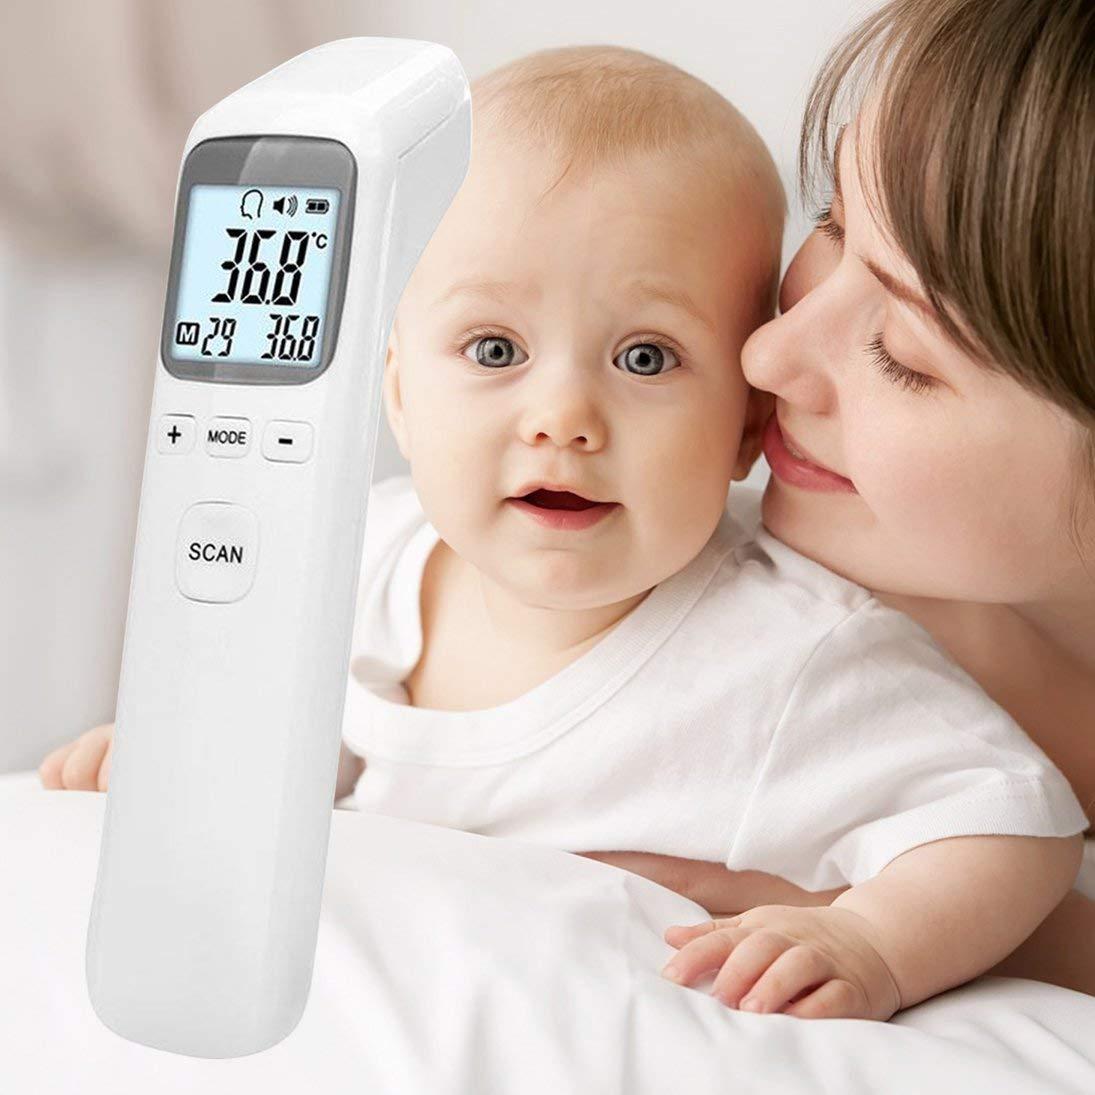 XINFULUK CK-1502 Handheld-Infrarot-Temperaturmessung Stehthermometer Ber/ührungsloses tragbares hochpr/äzises Thermometer